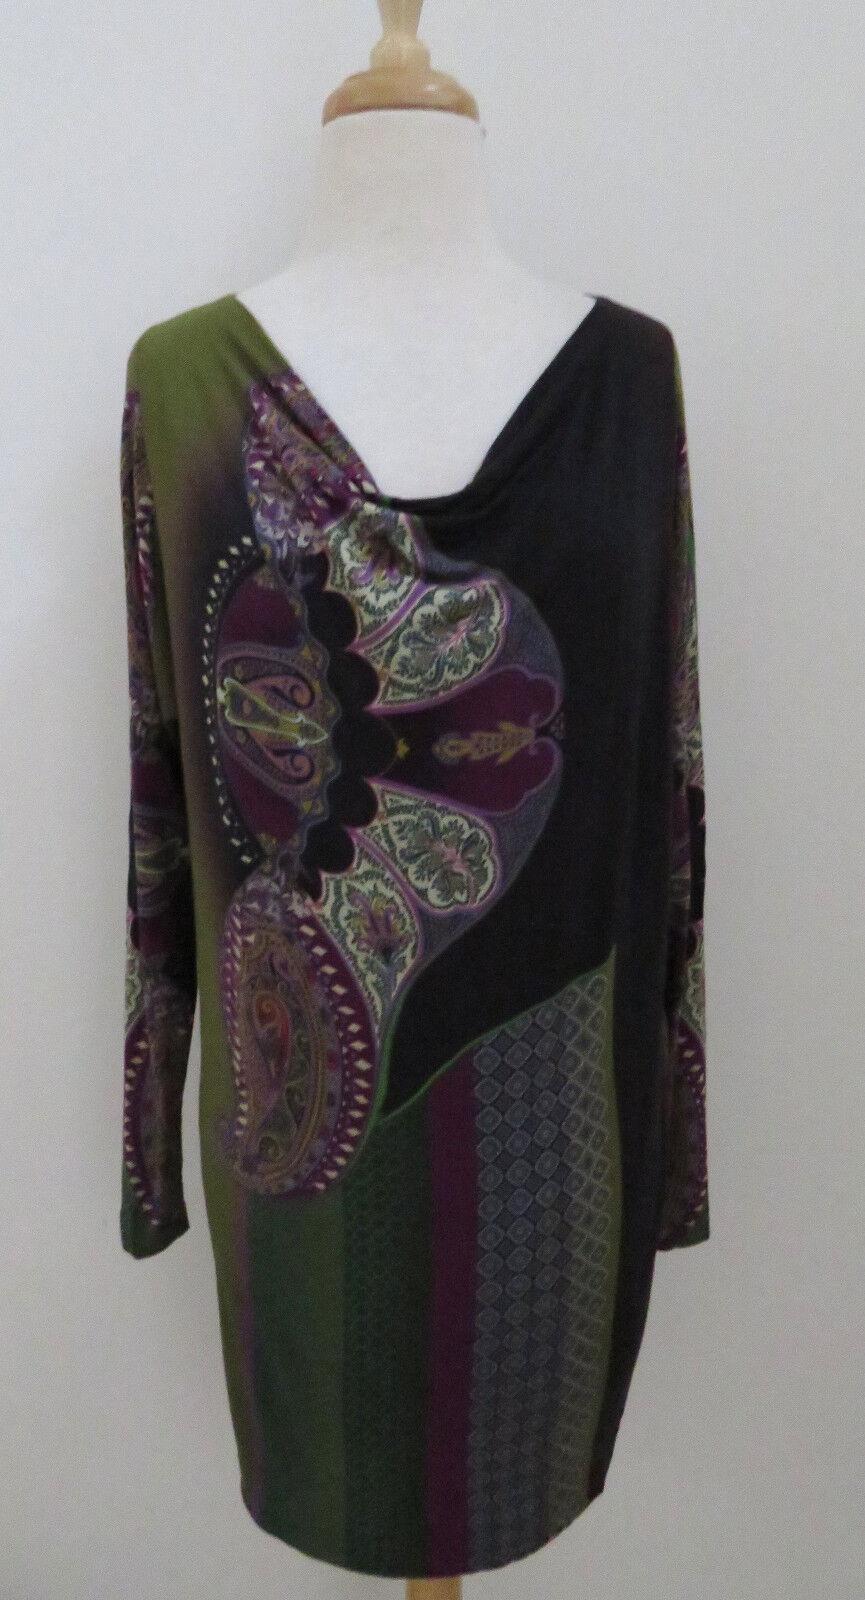 ETRO Paisley print jersey shift dress sz 42 Draped neck